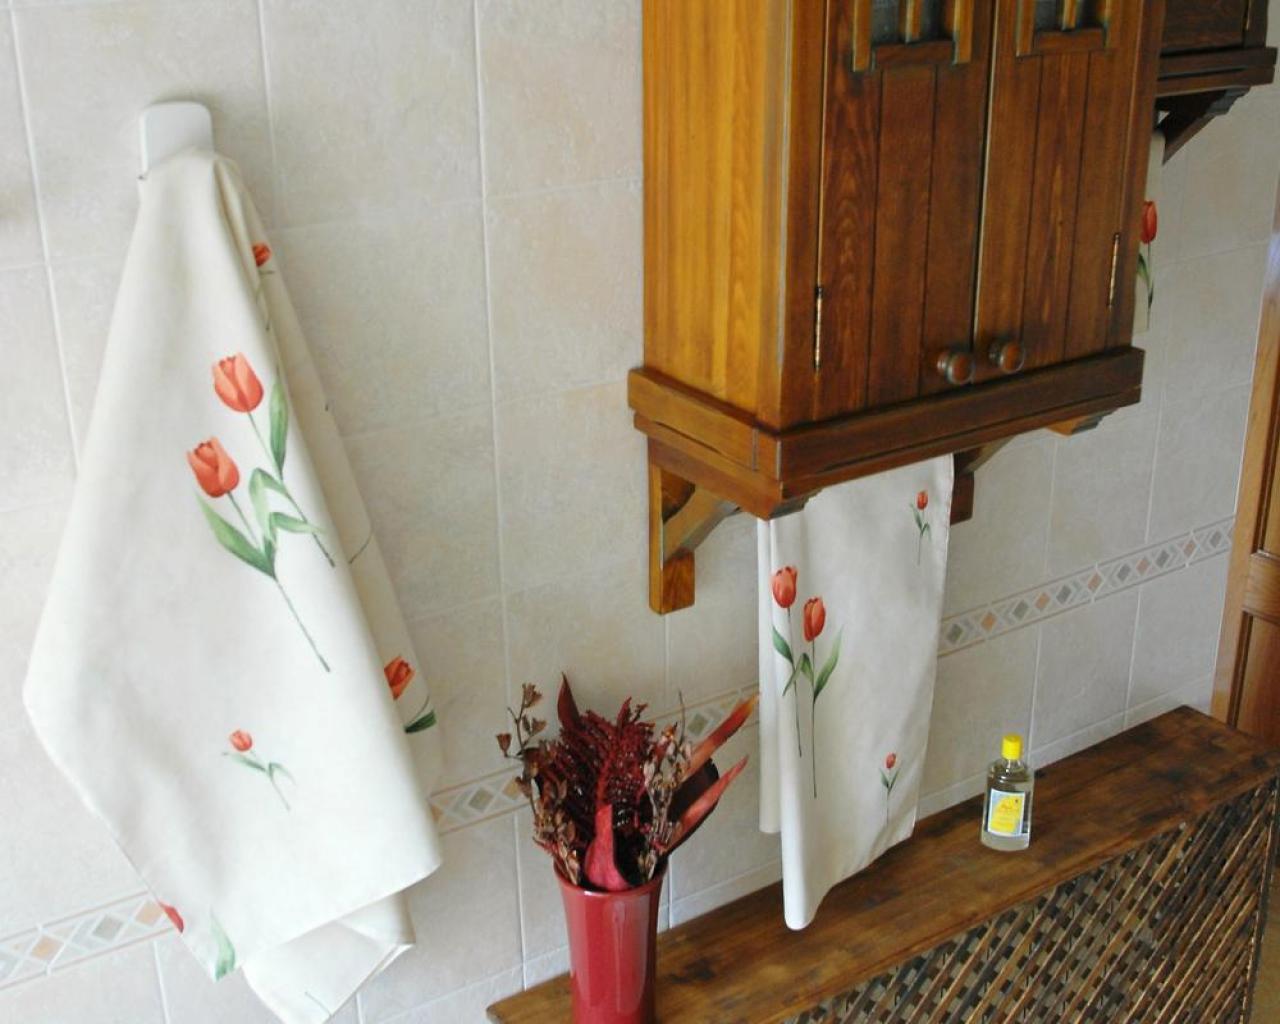 Alquiler de habitaciones Narrillos de San Leonardo, Ávila